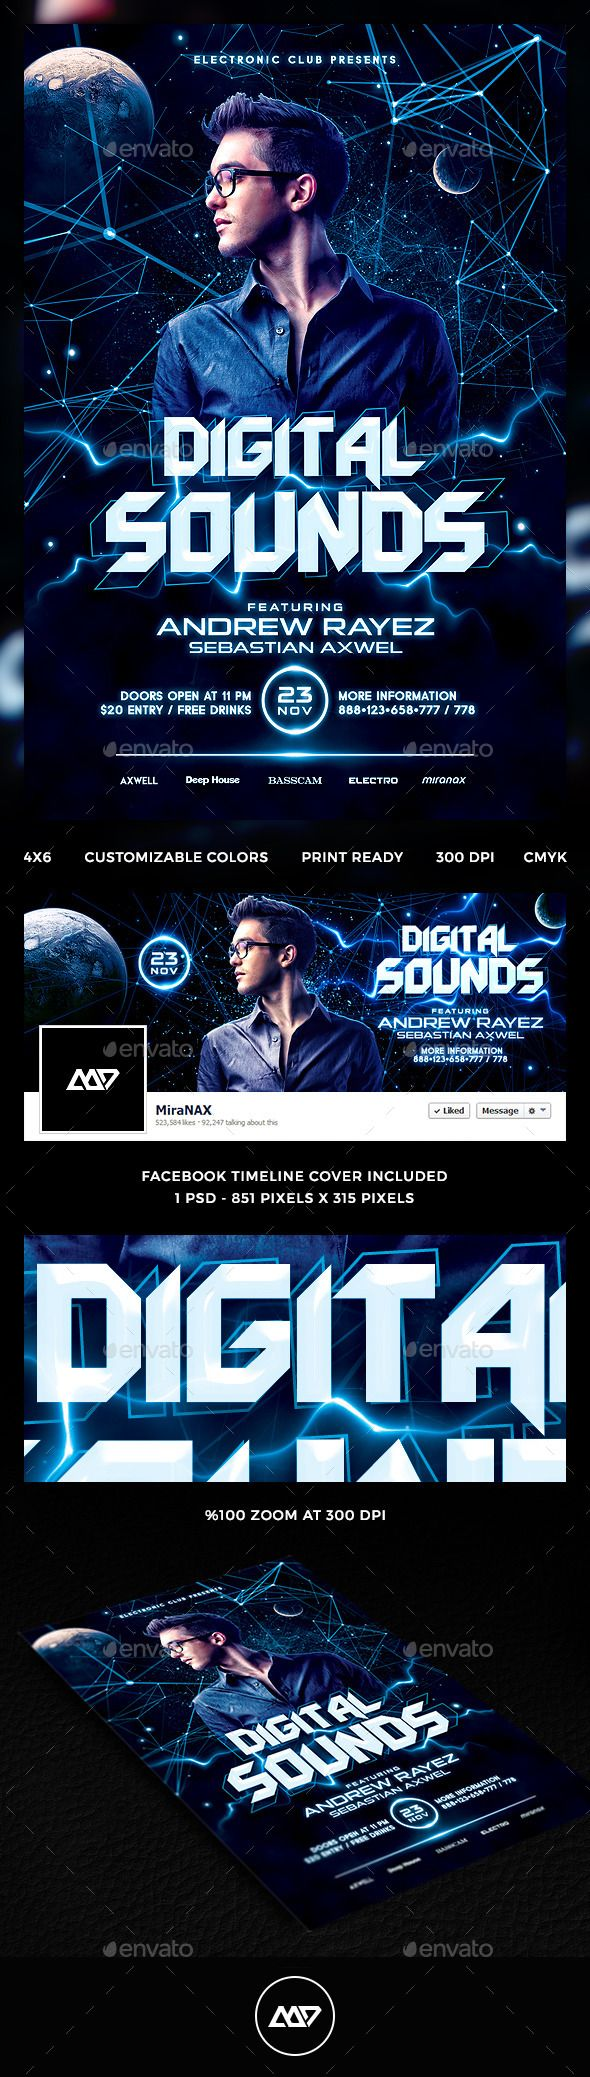 Electro DJ Flyer PSD + Facebook Cover Design Tempalte Download: http://graphicriver.net/item/electro-dj-flyer-psd-facebook-cover/12515839?ref=ksioks